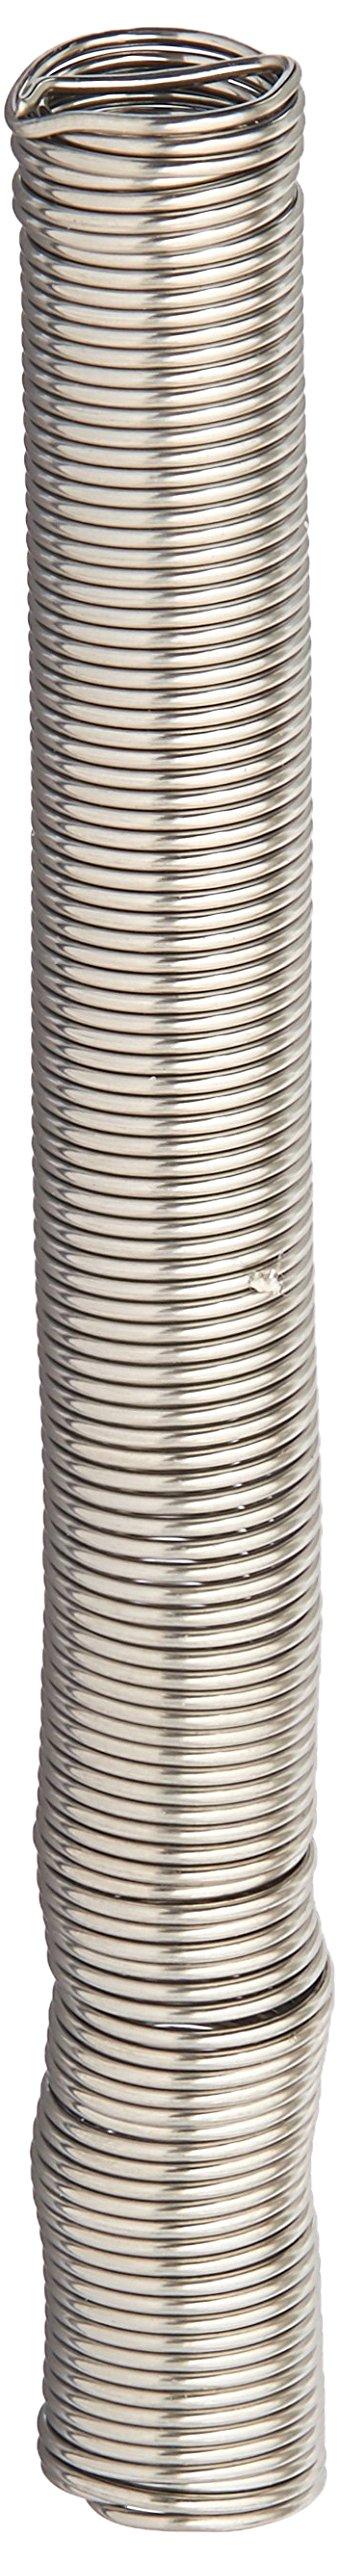 Kester 83-4000-0000 SN60PB40 Solder Pocket Pack, 0.031'' Wire Diameter